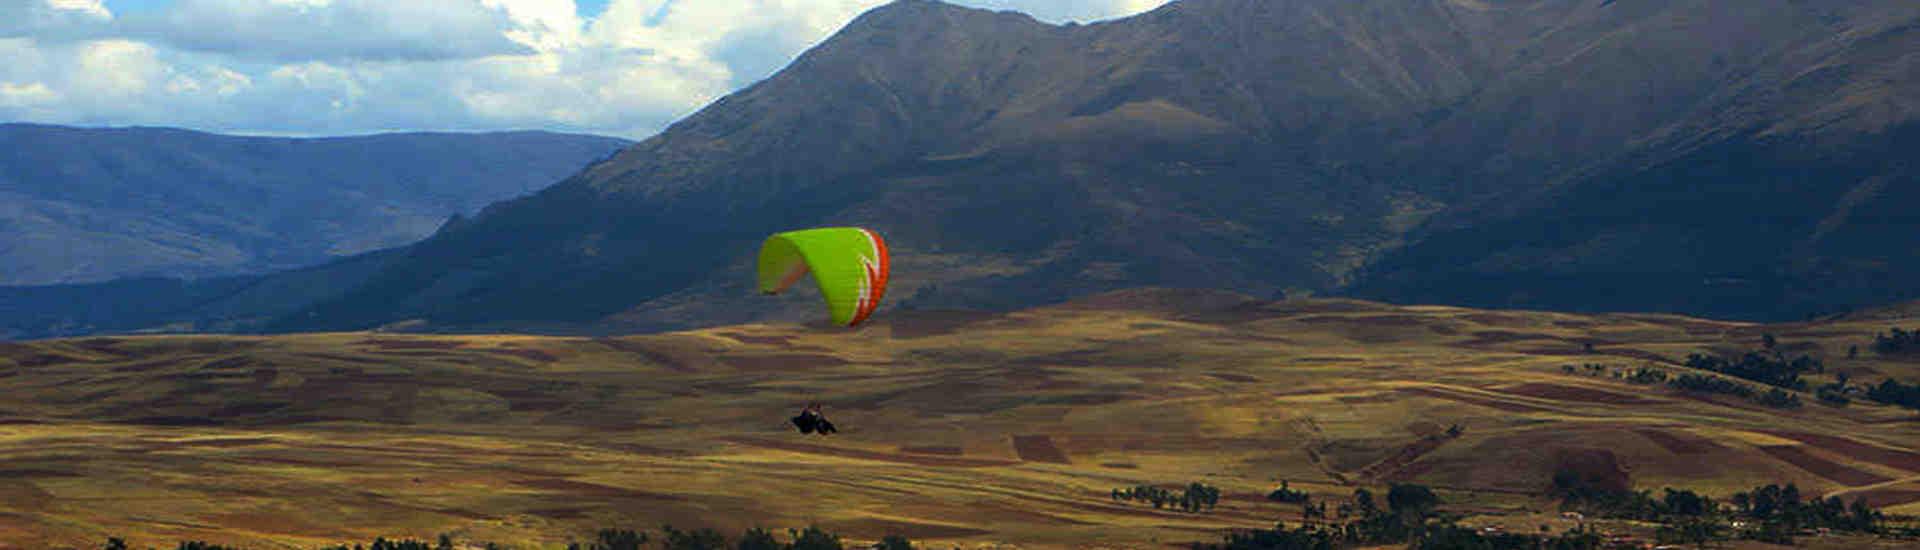 tours paragliding toursperumachupicchu.com agencia de viajes en cusco